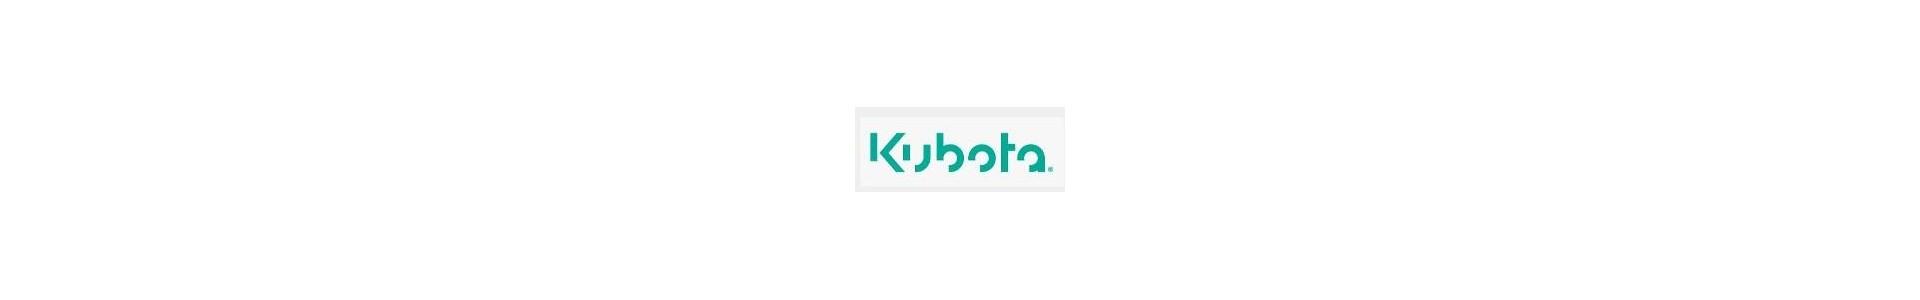 Injecteurs Kubota